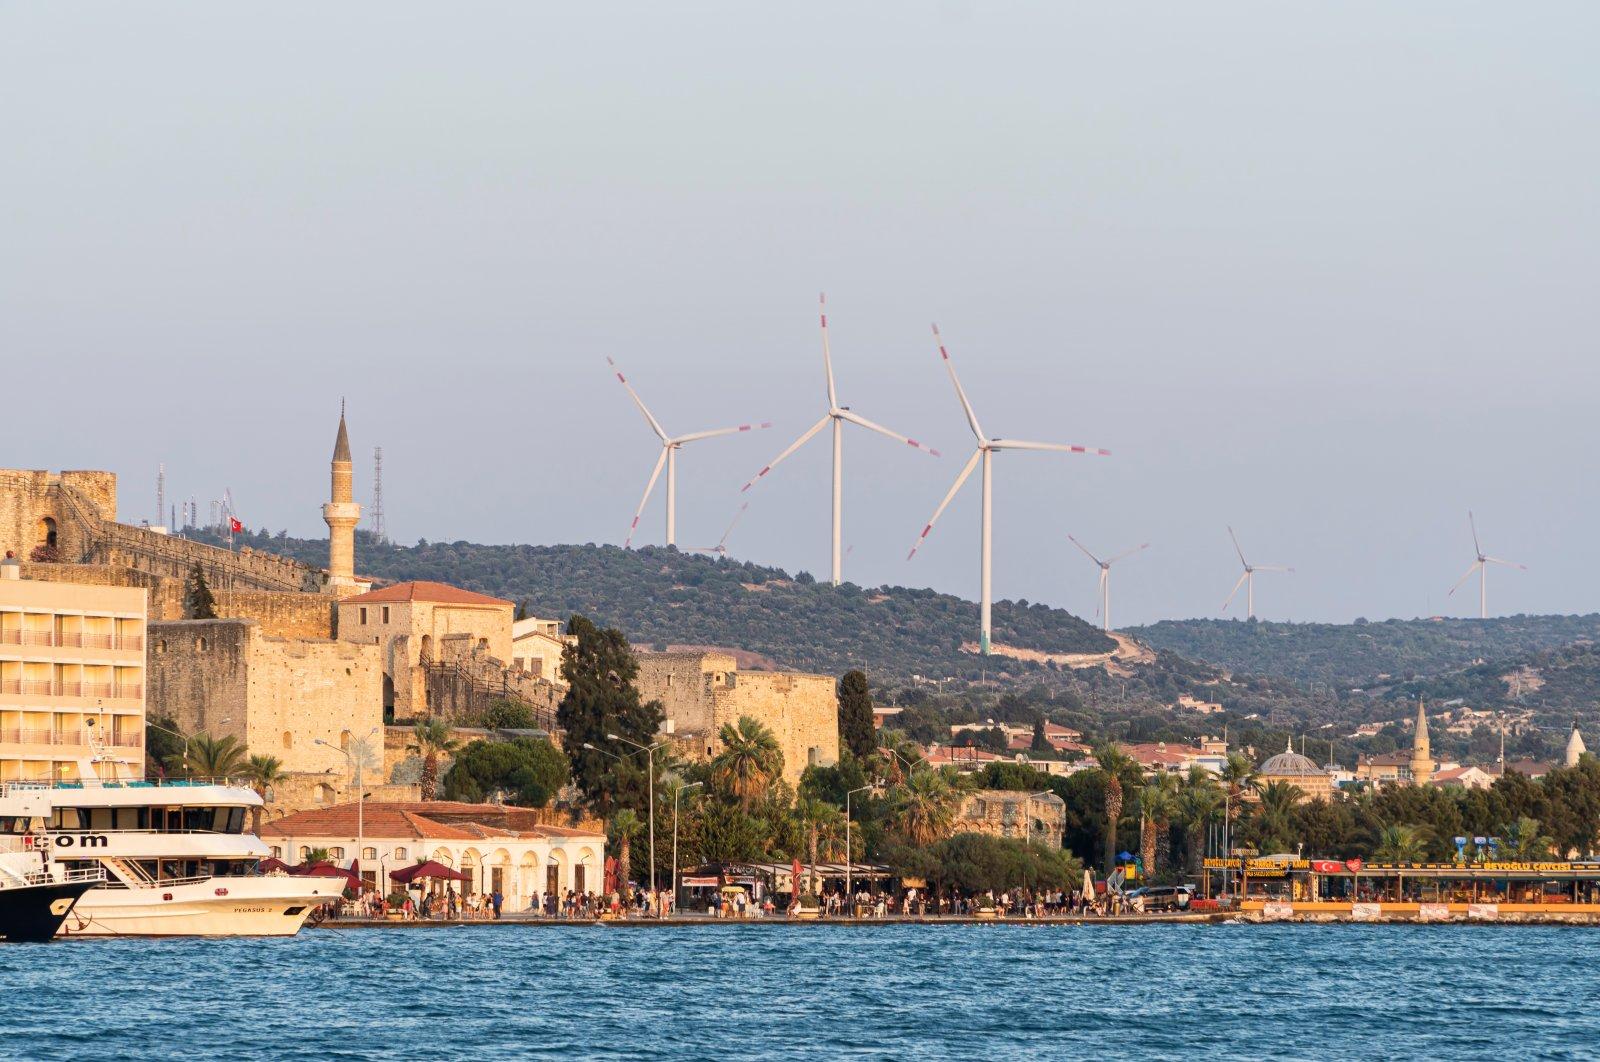 Windmills dot the skyline above the Çeşme coastline, İzmir, western Turkey, July 31, 2019. (Shutterstock Photo)